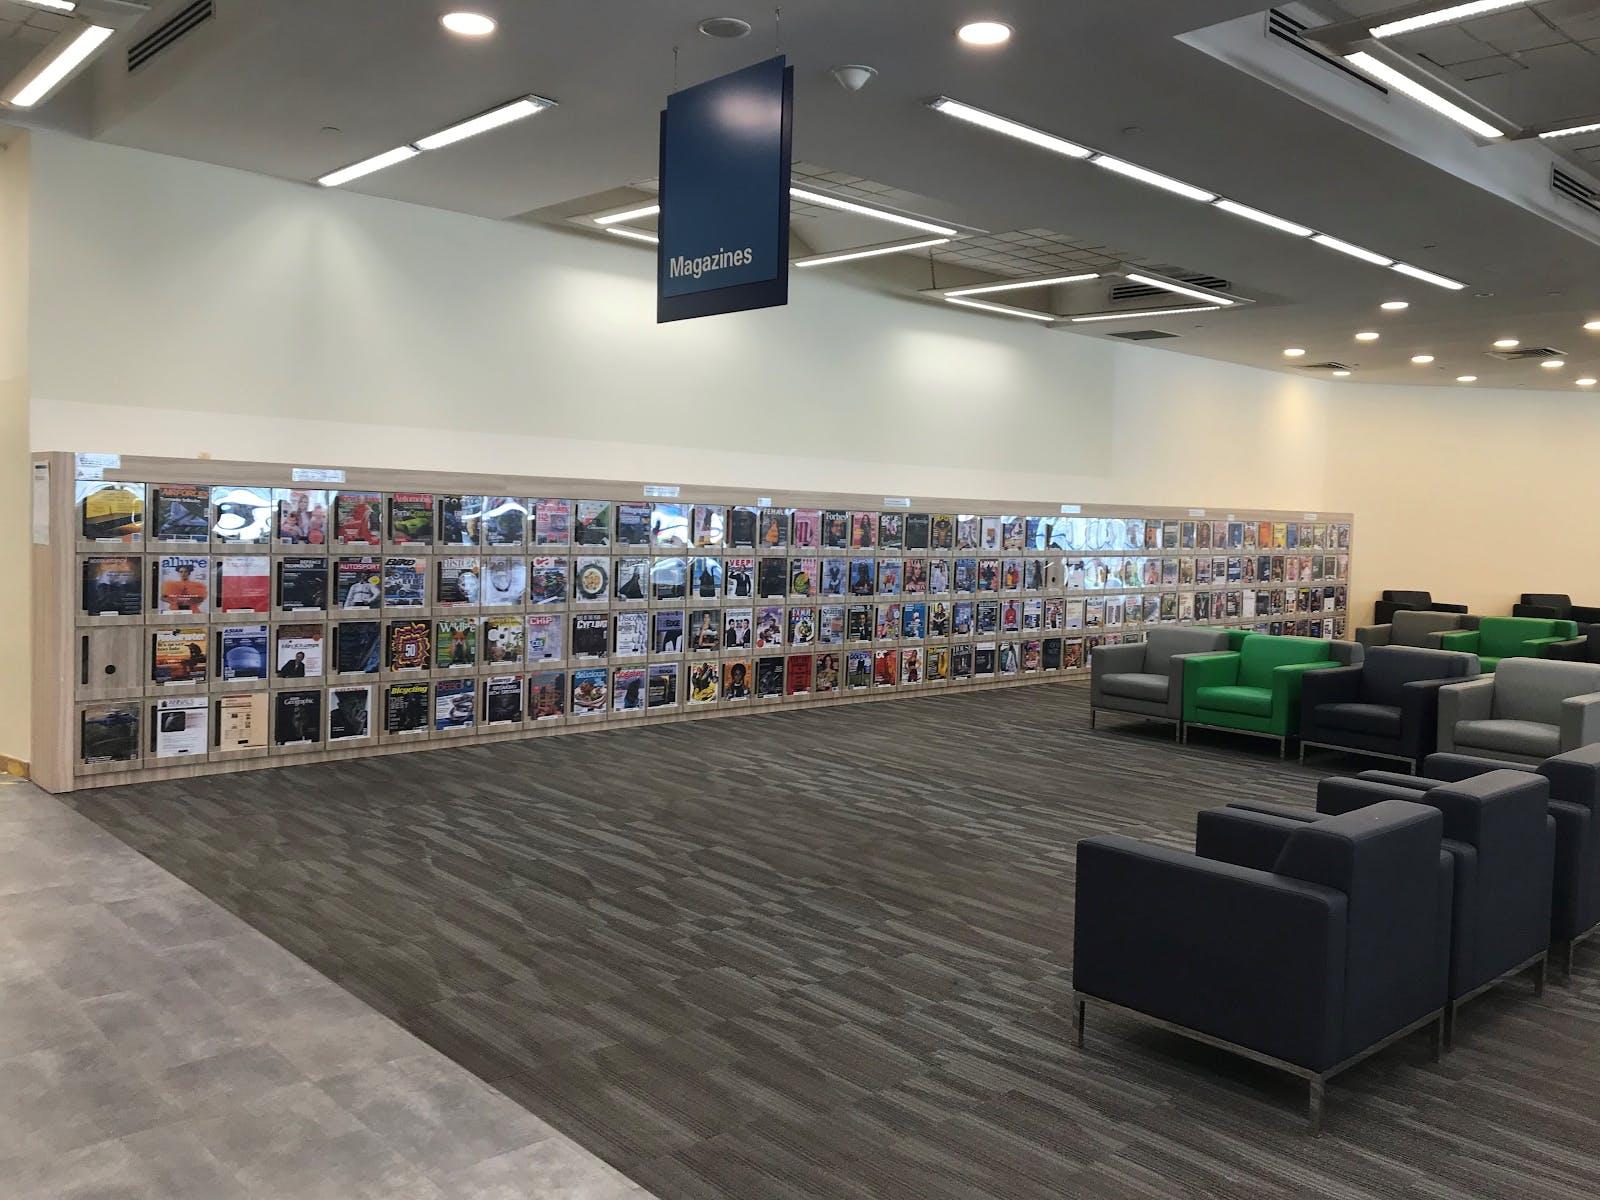 Woodlands Regional Library